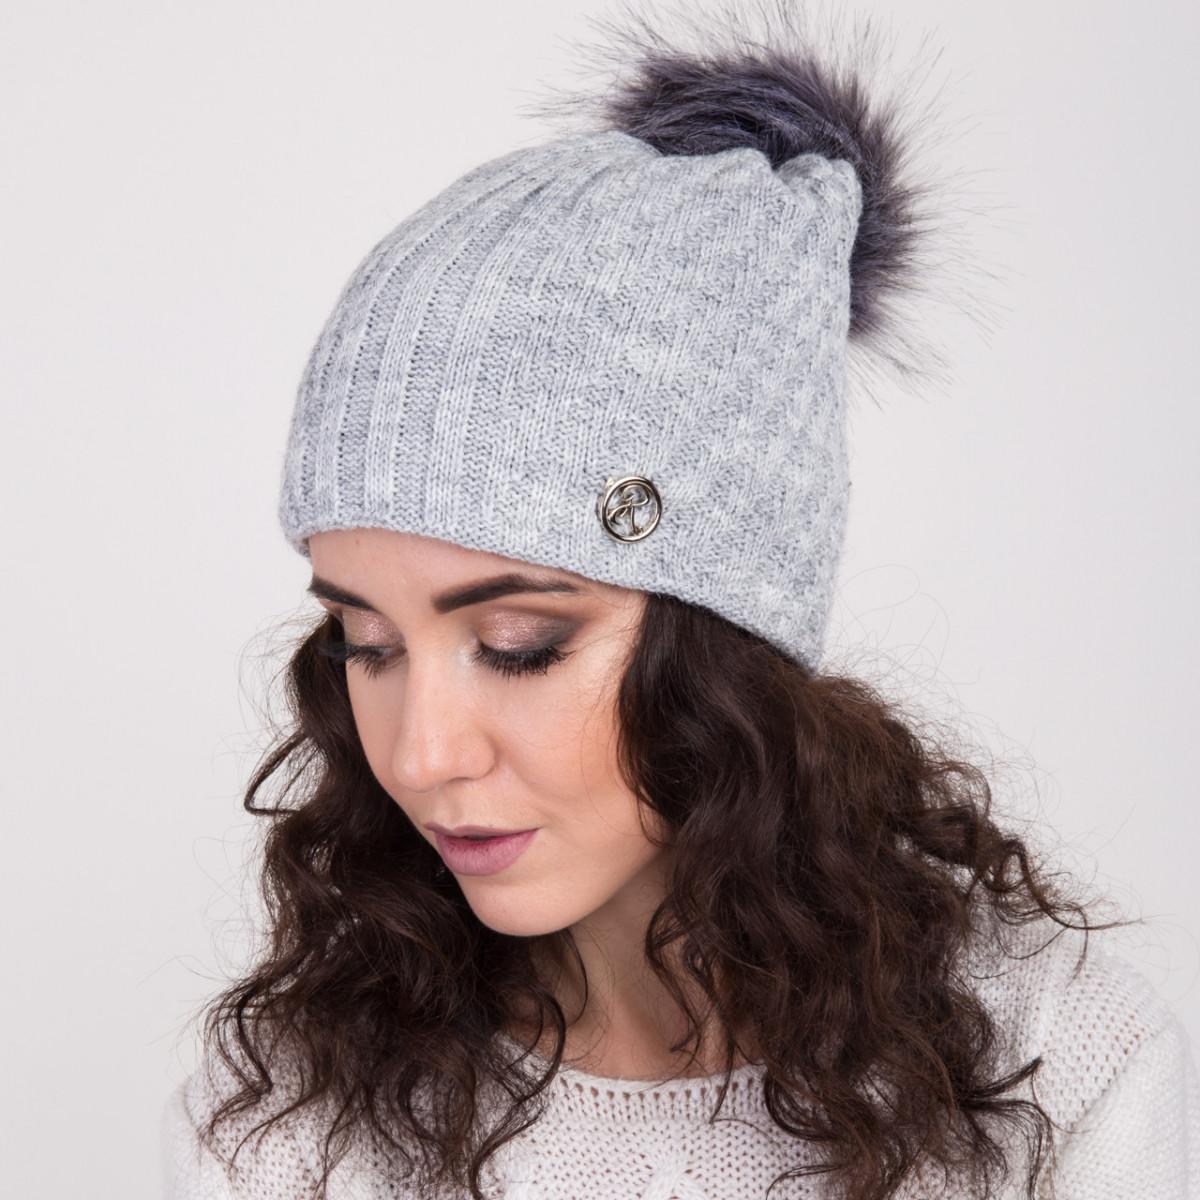 Женская вязанная шапка с меховым помпоном - зима 2018 - Артикул 2148 (серый)